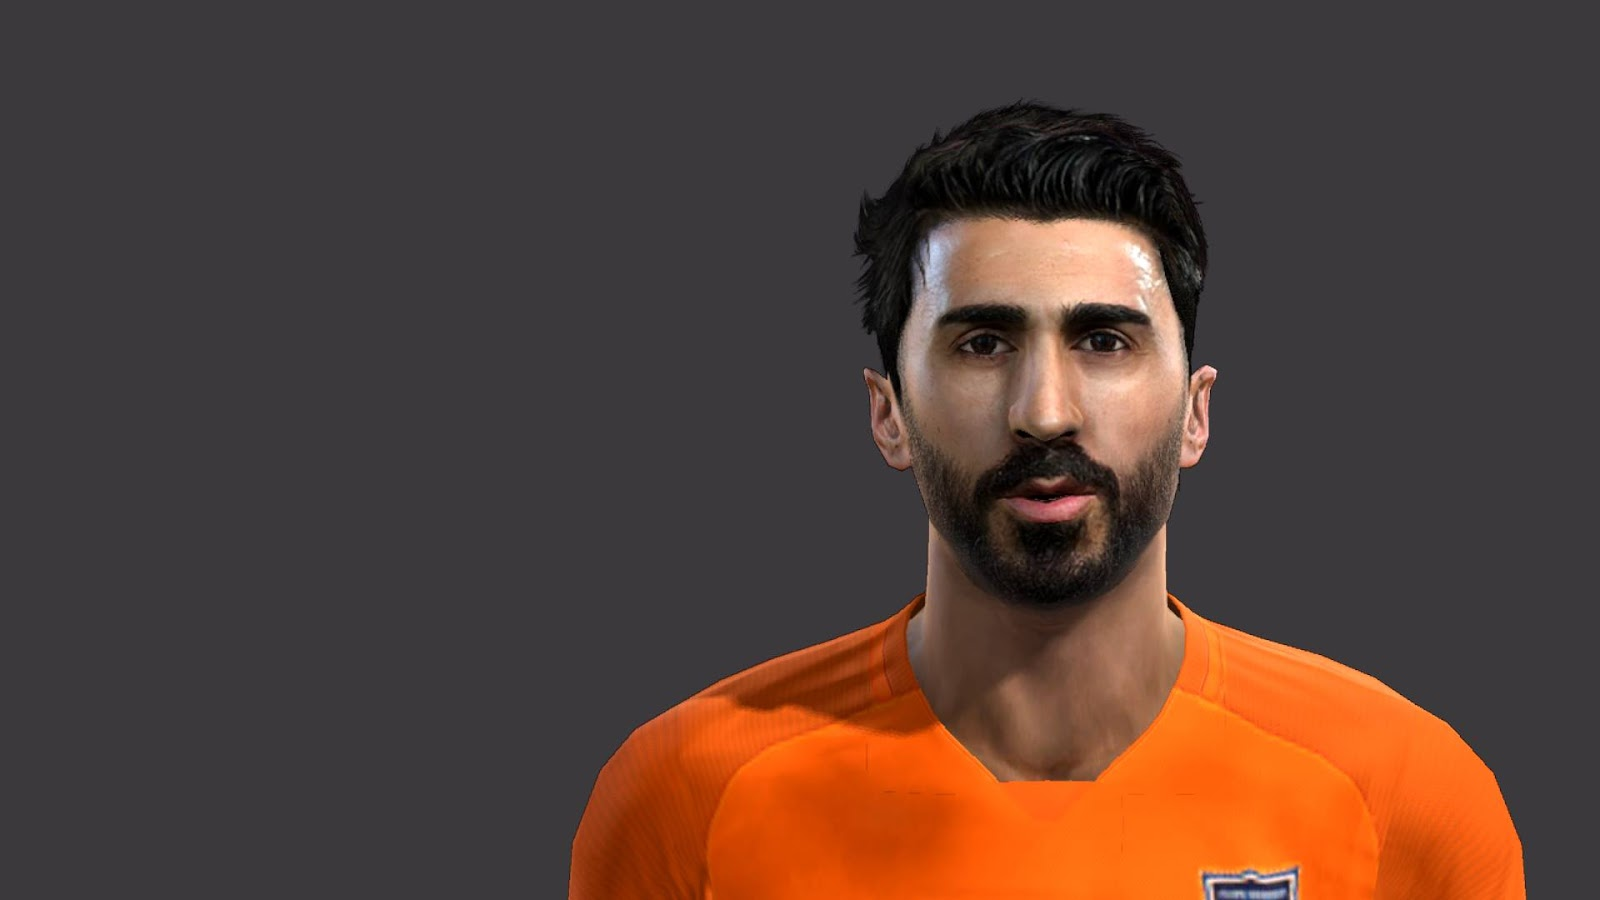 PES 2013 Mahmut Tekdemir (Basaksehir FK) Face by EmreKaya